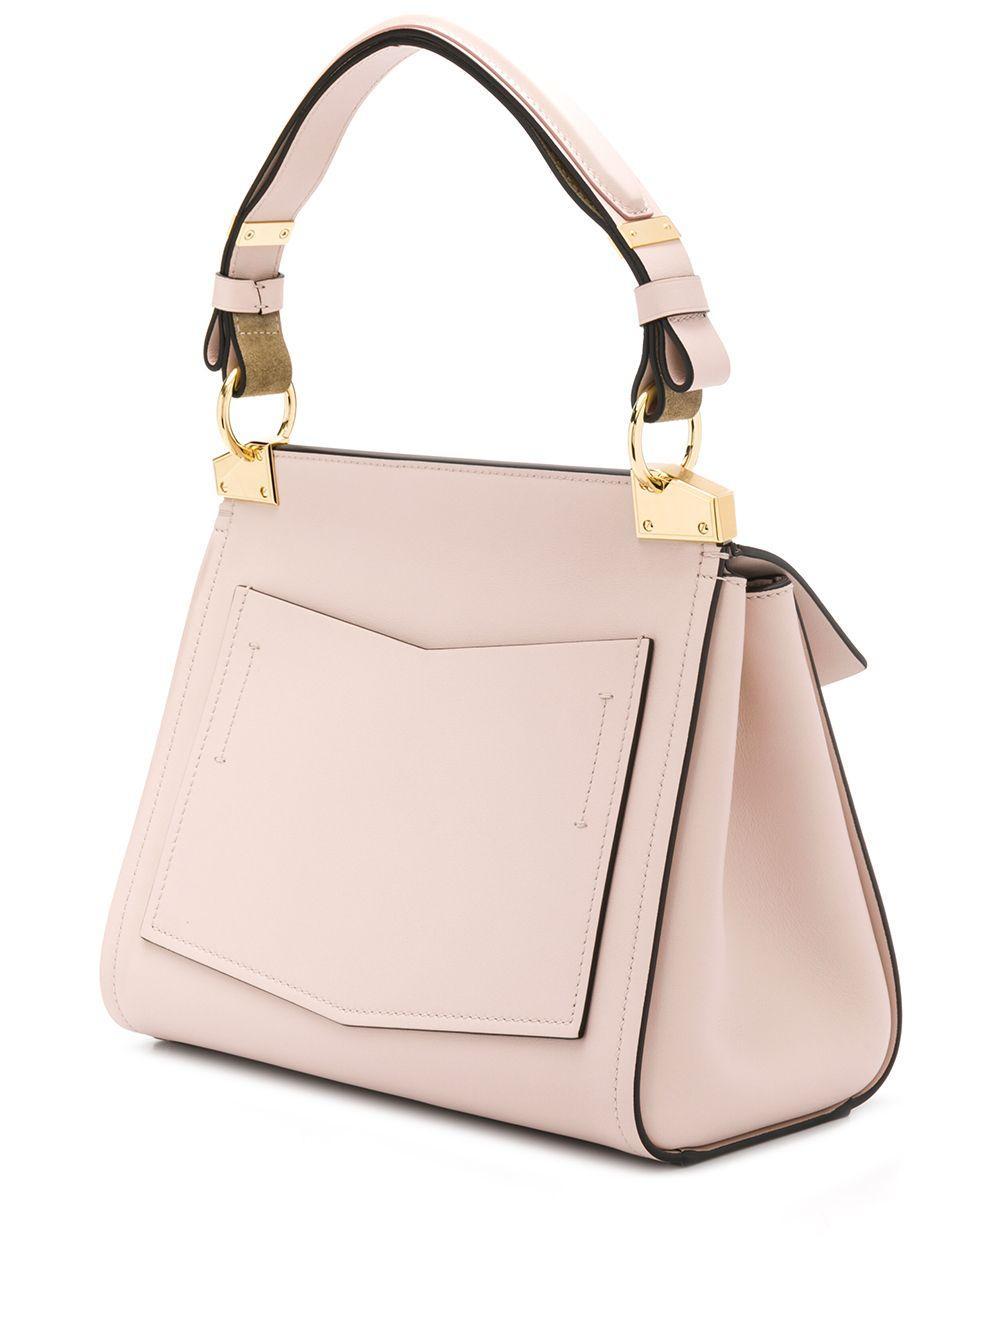 Sac à main Mystic Cuir Givenchy en coloris Rose Qivy